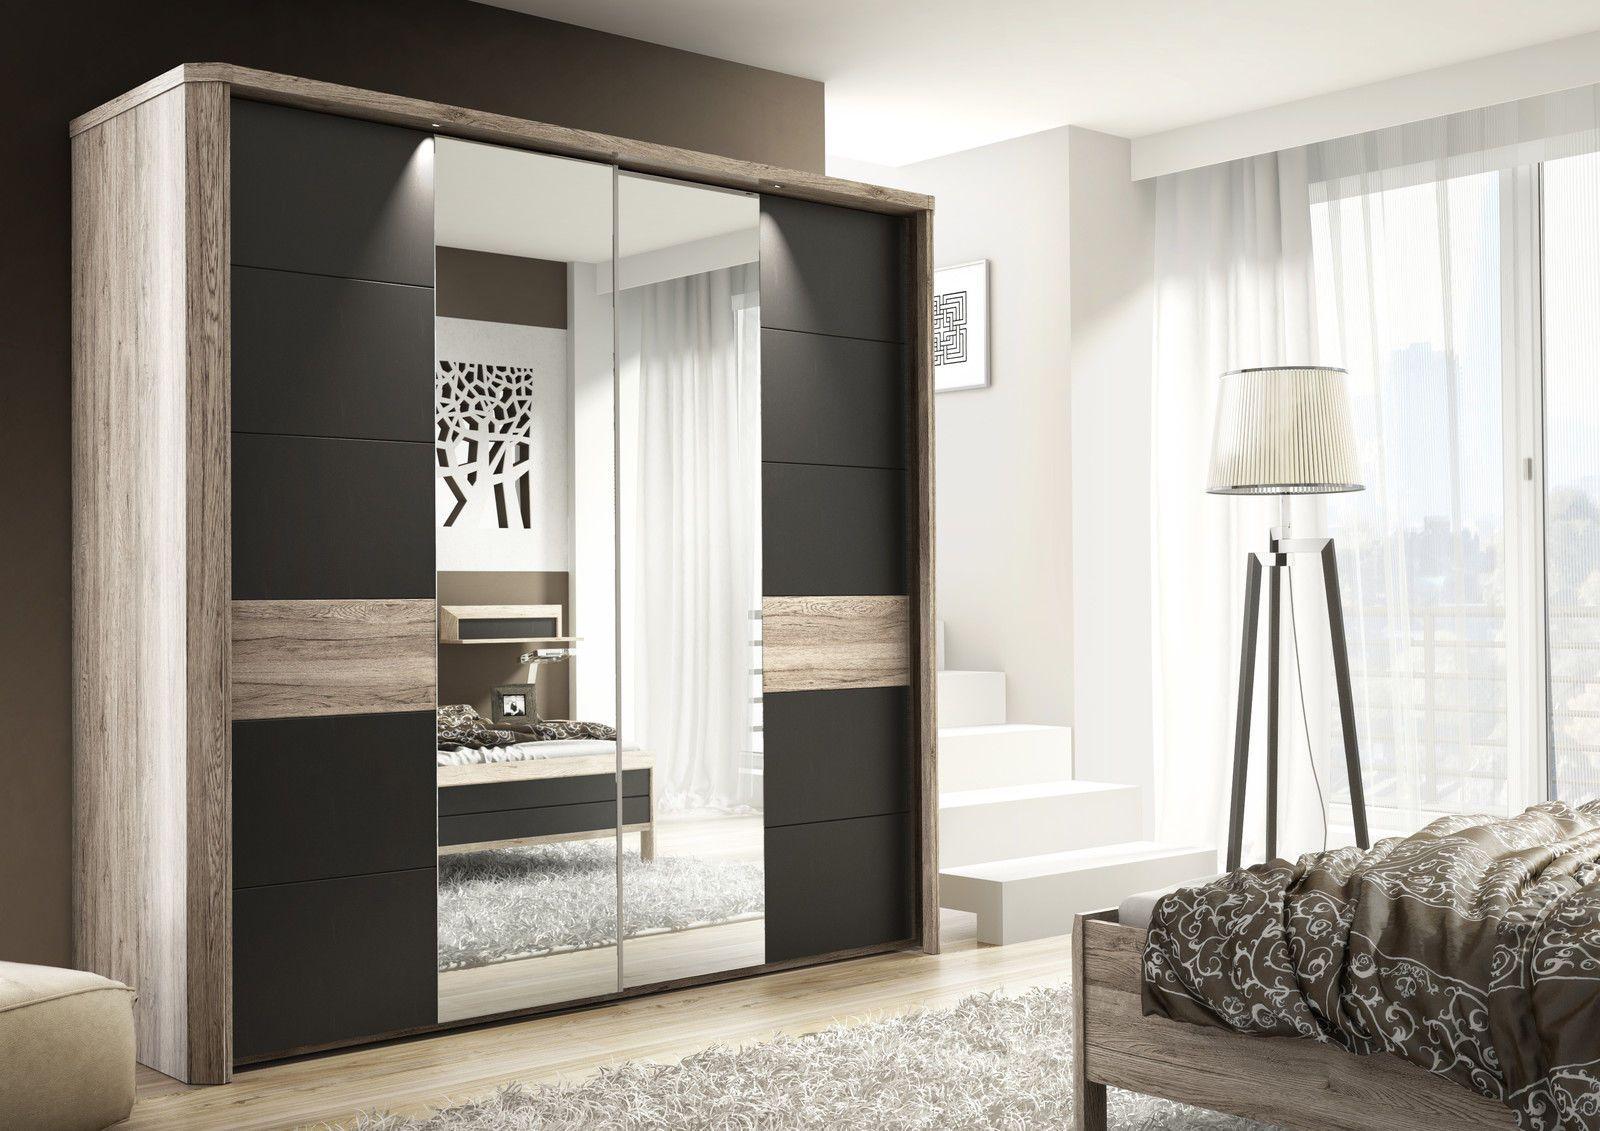 Mocha Sliding 2 Door Mirrored Wardrobe Cupboard Brown And Oak